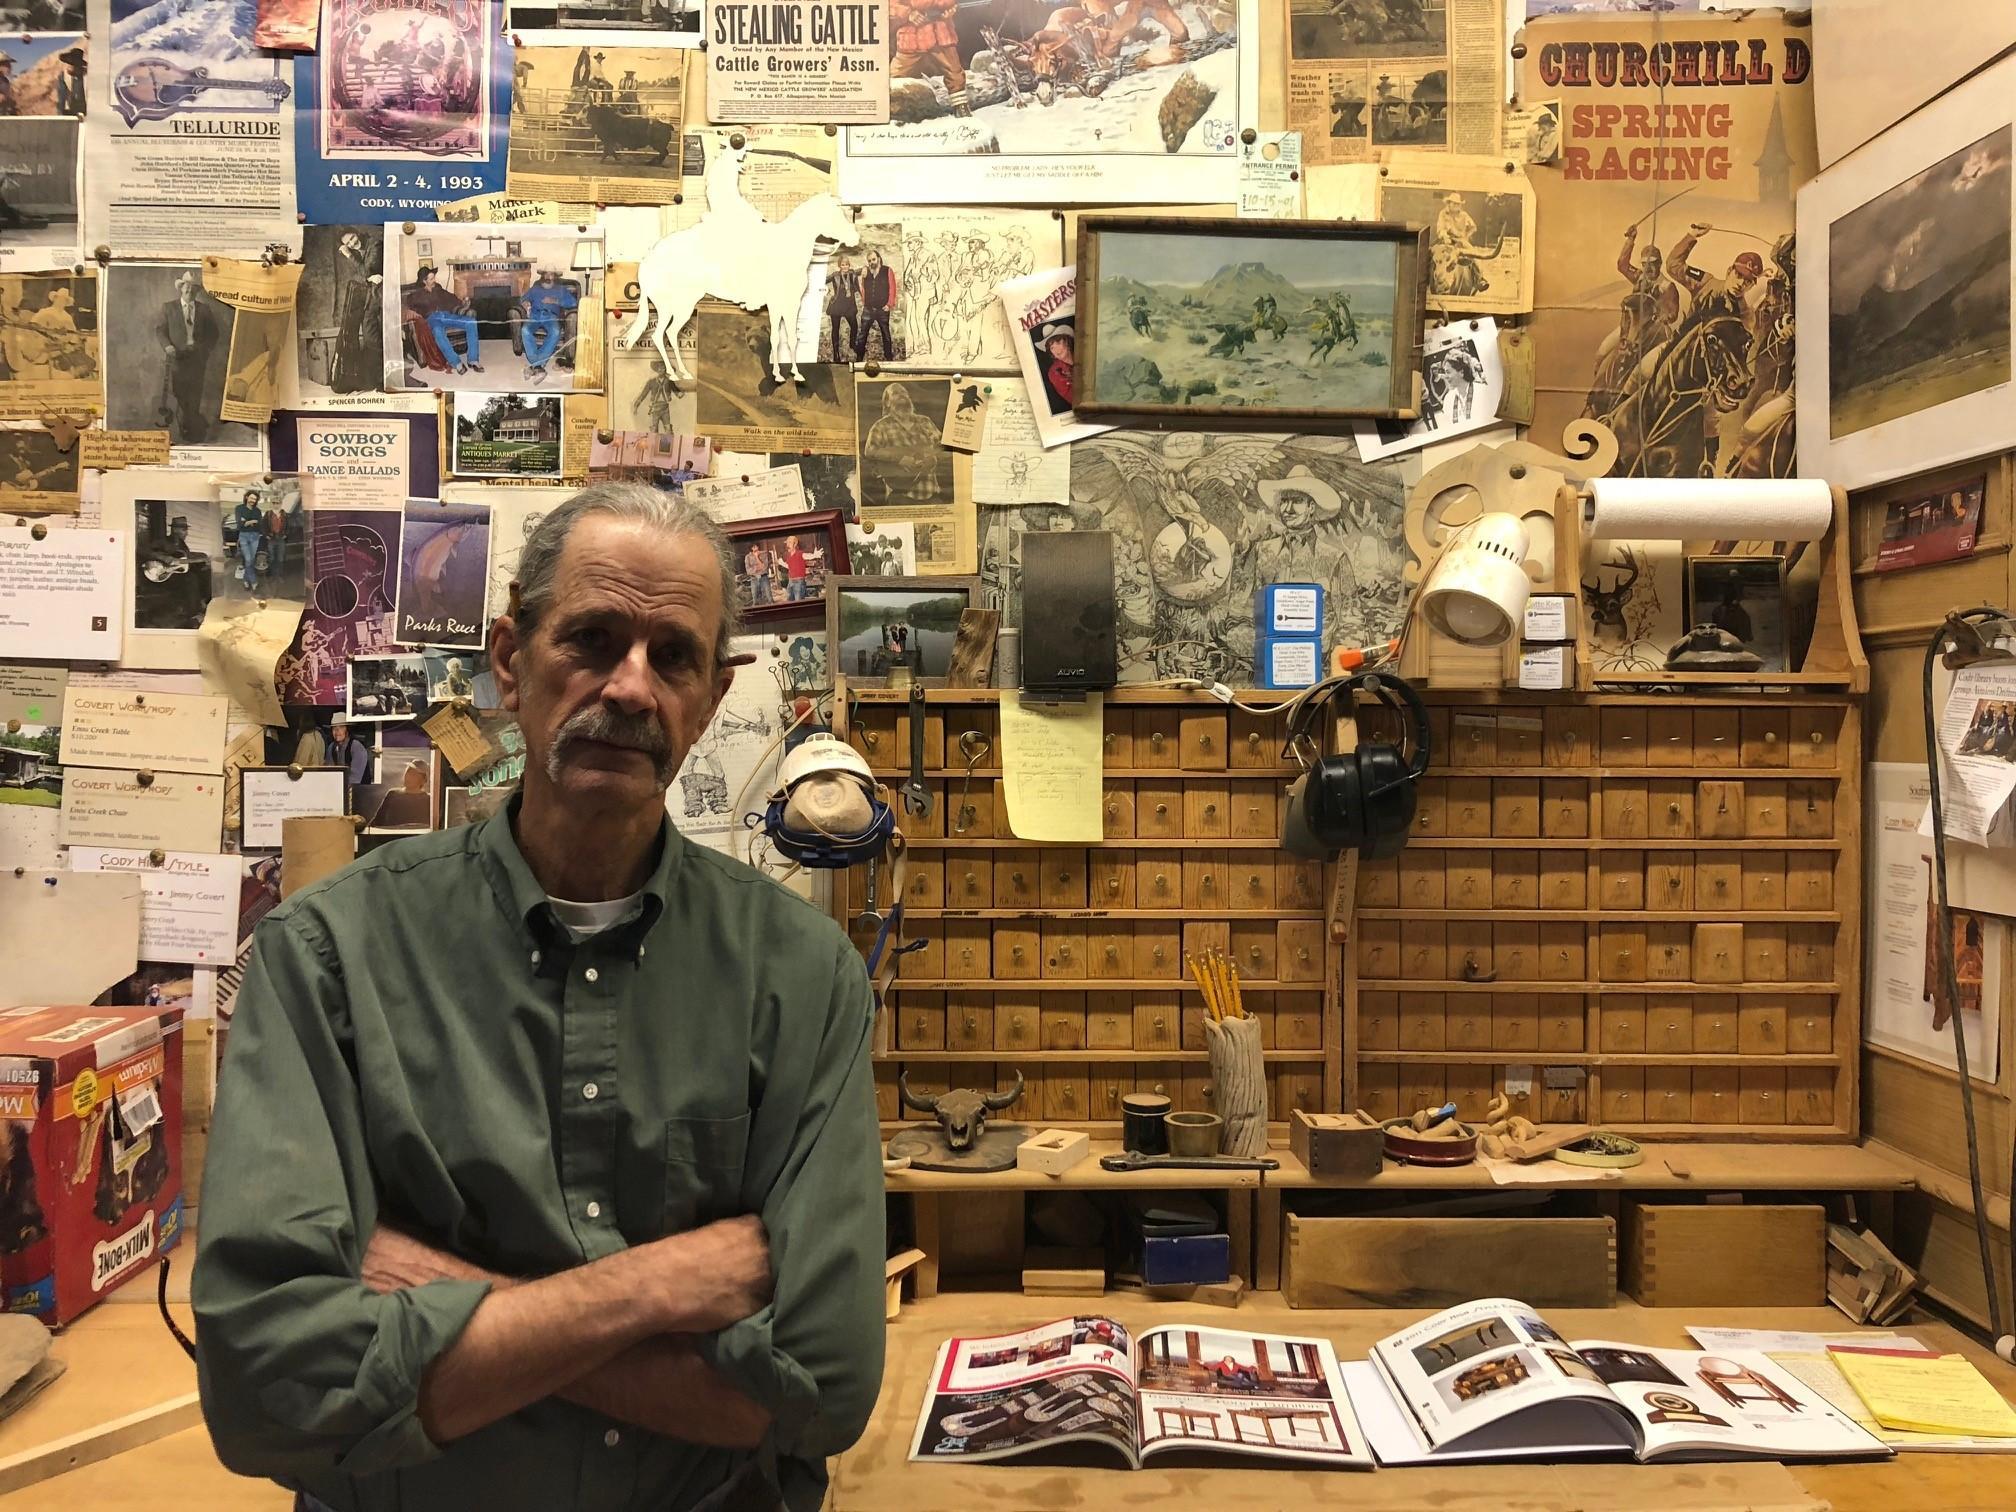 Jimmy Covert in his wood workshop in Cody. Credit: Kamila Kudelska